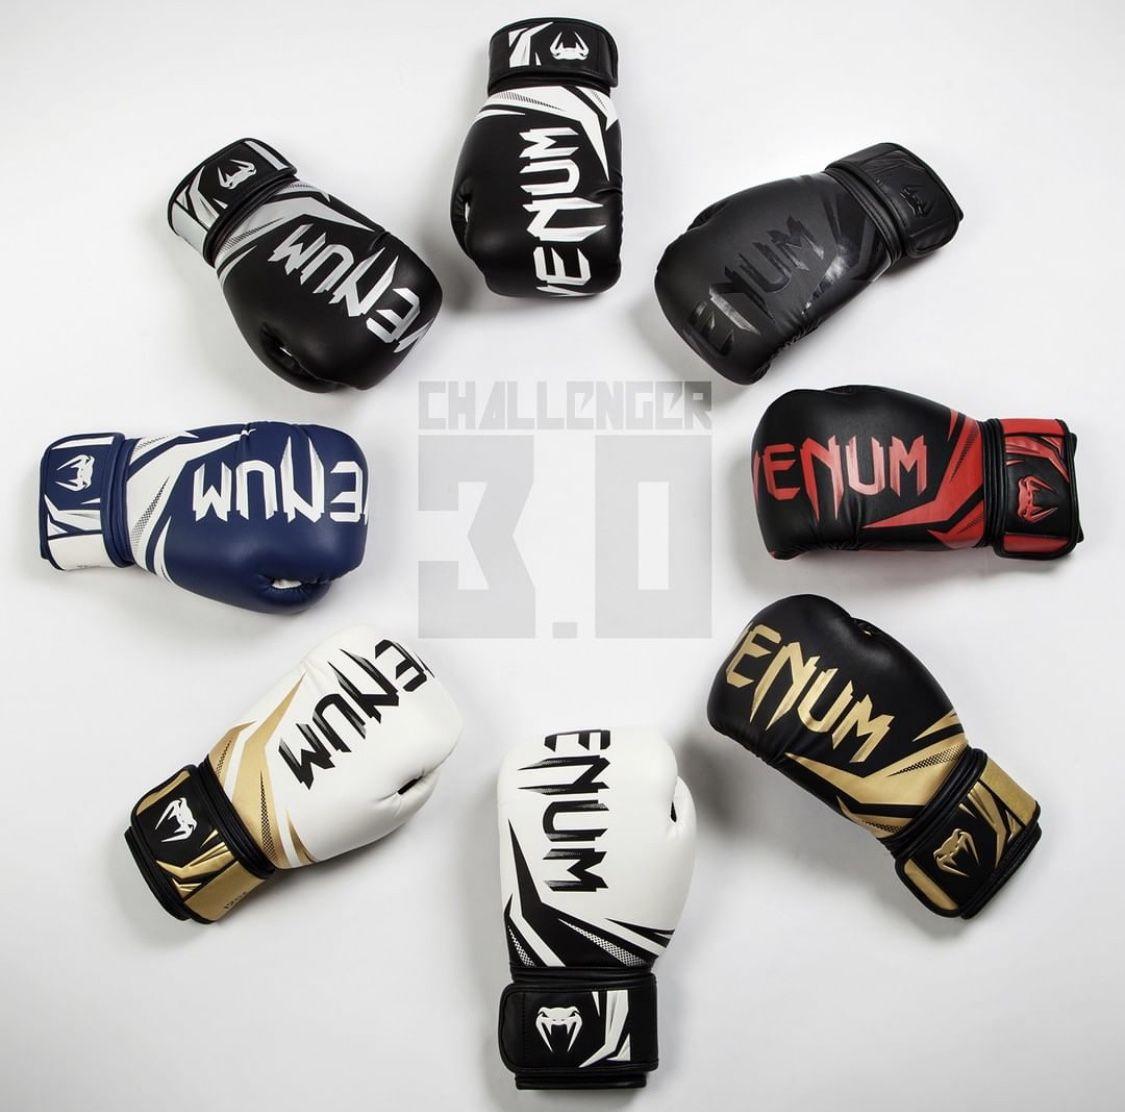 Venum Challenger 3 0 Boxing Gloves Black Black In 2020 Boxing Gloves Muay Thai Gloves Boxing Equipment